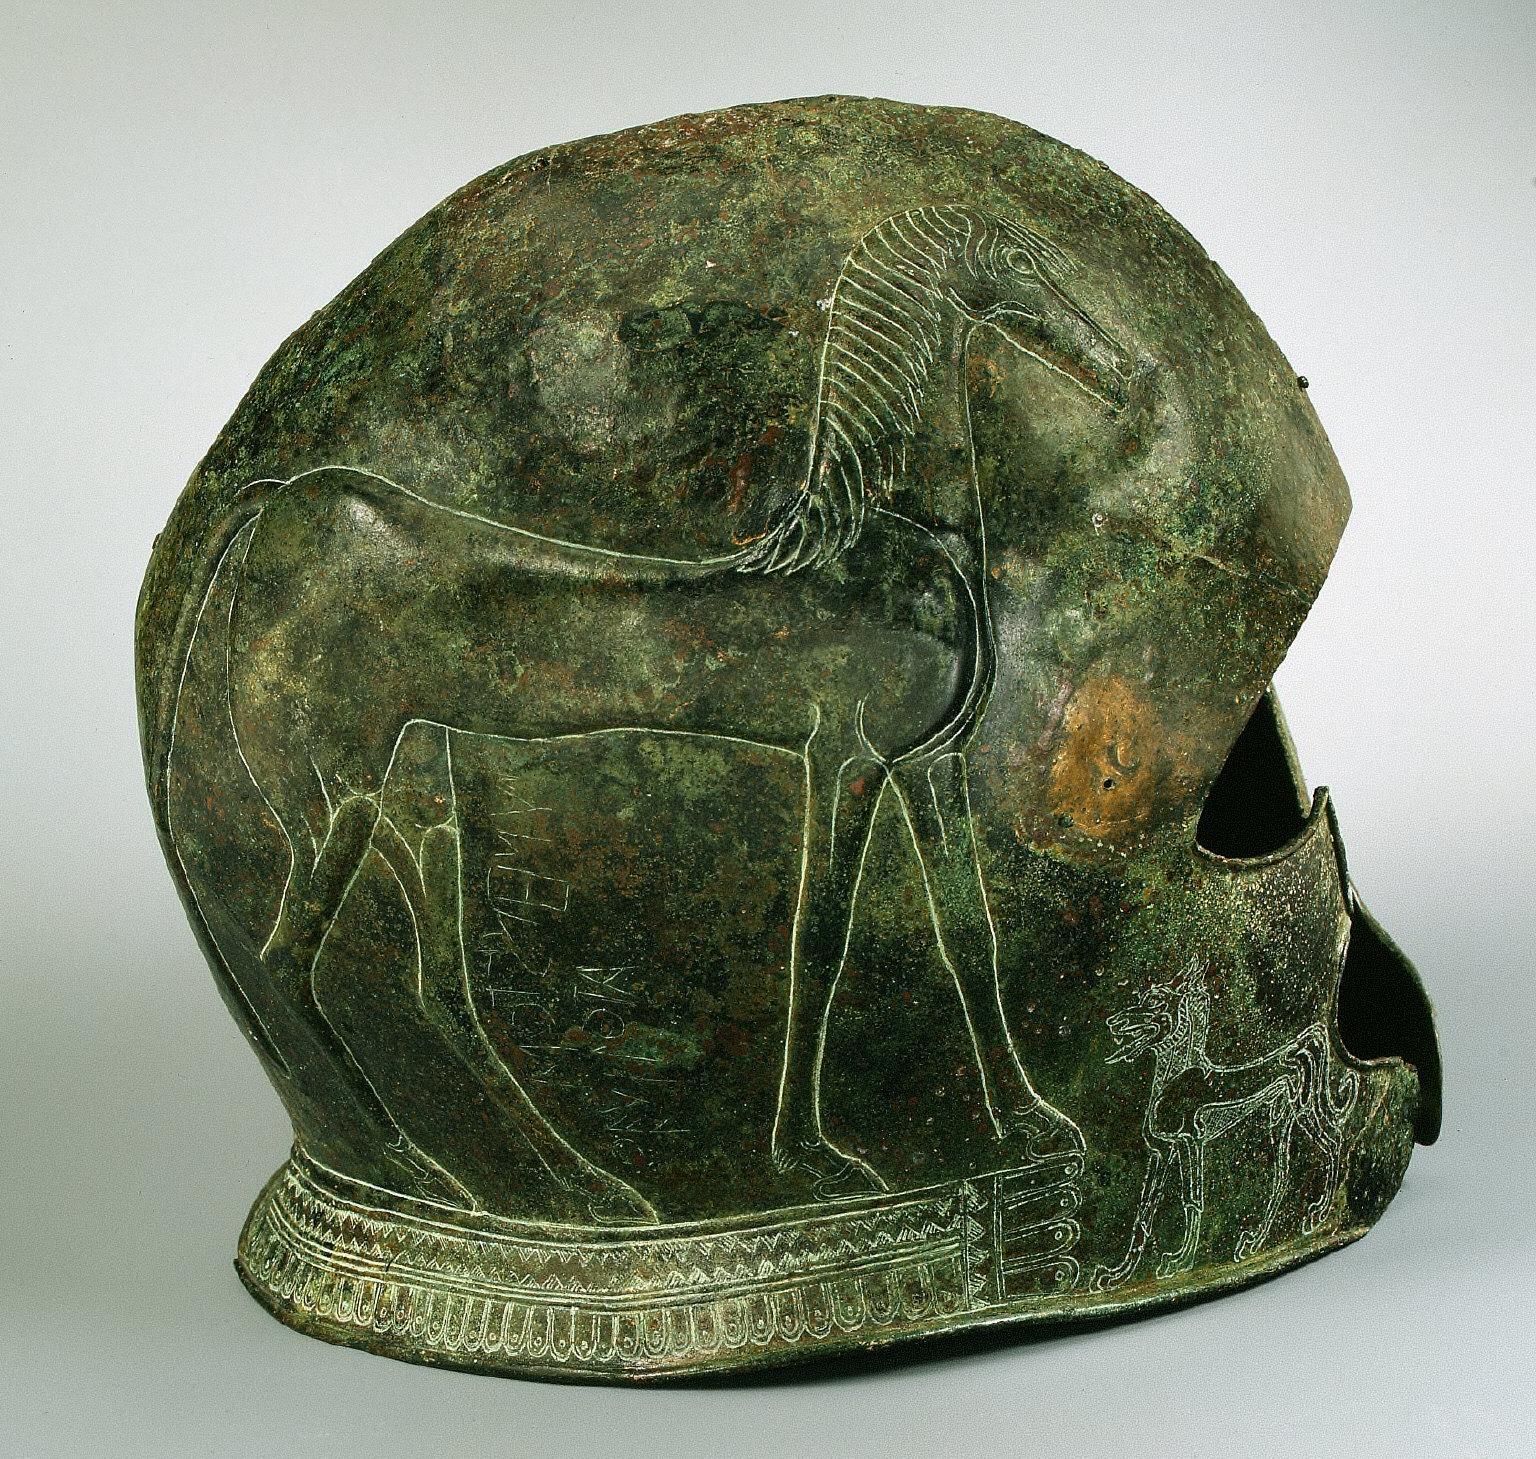 Two helmets